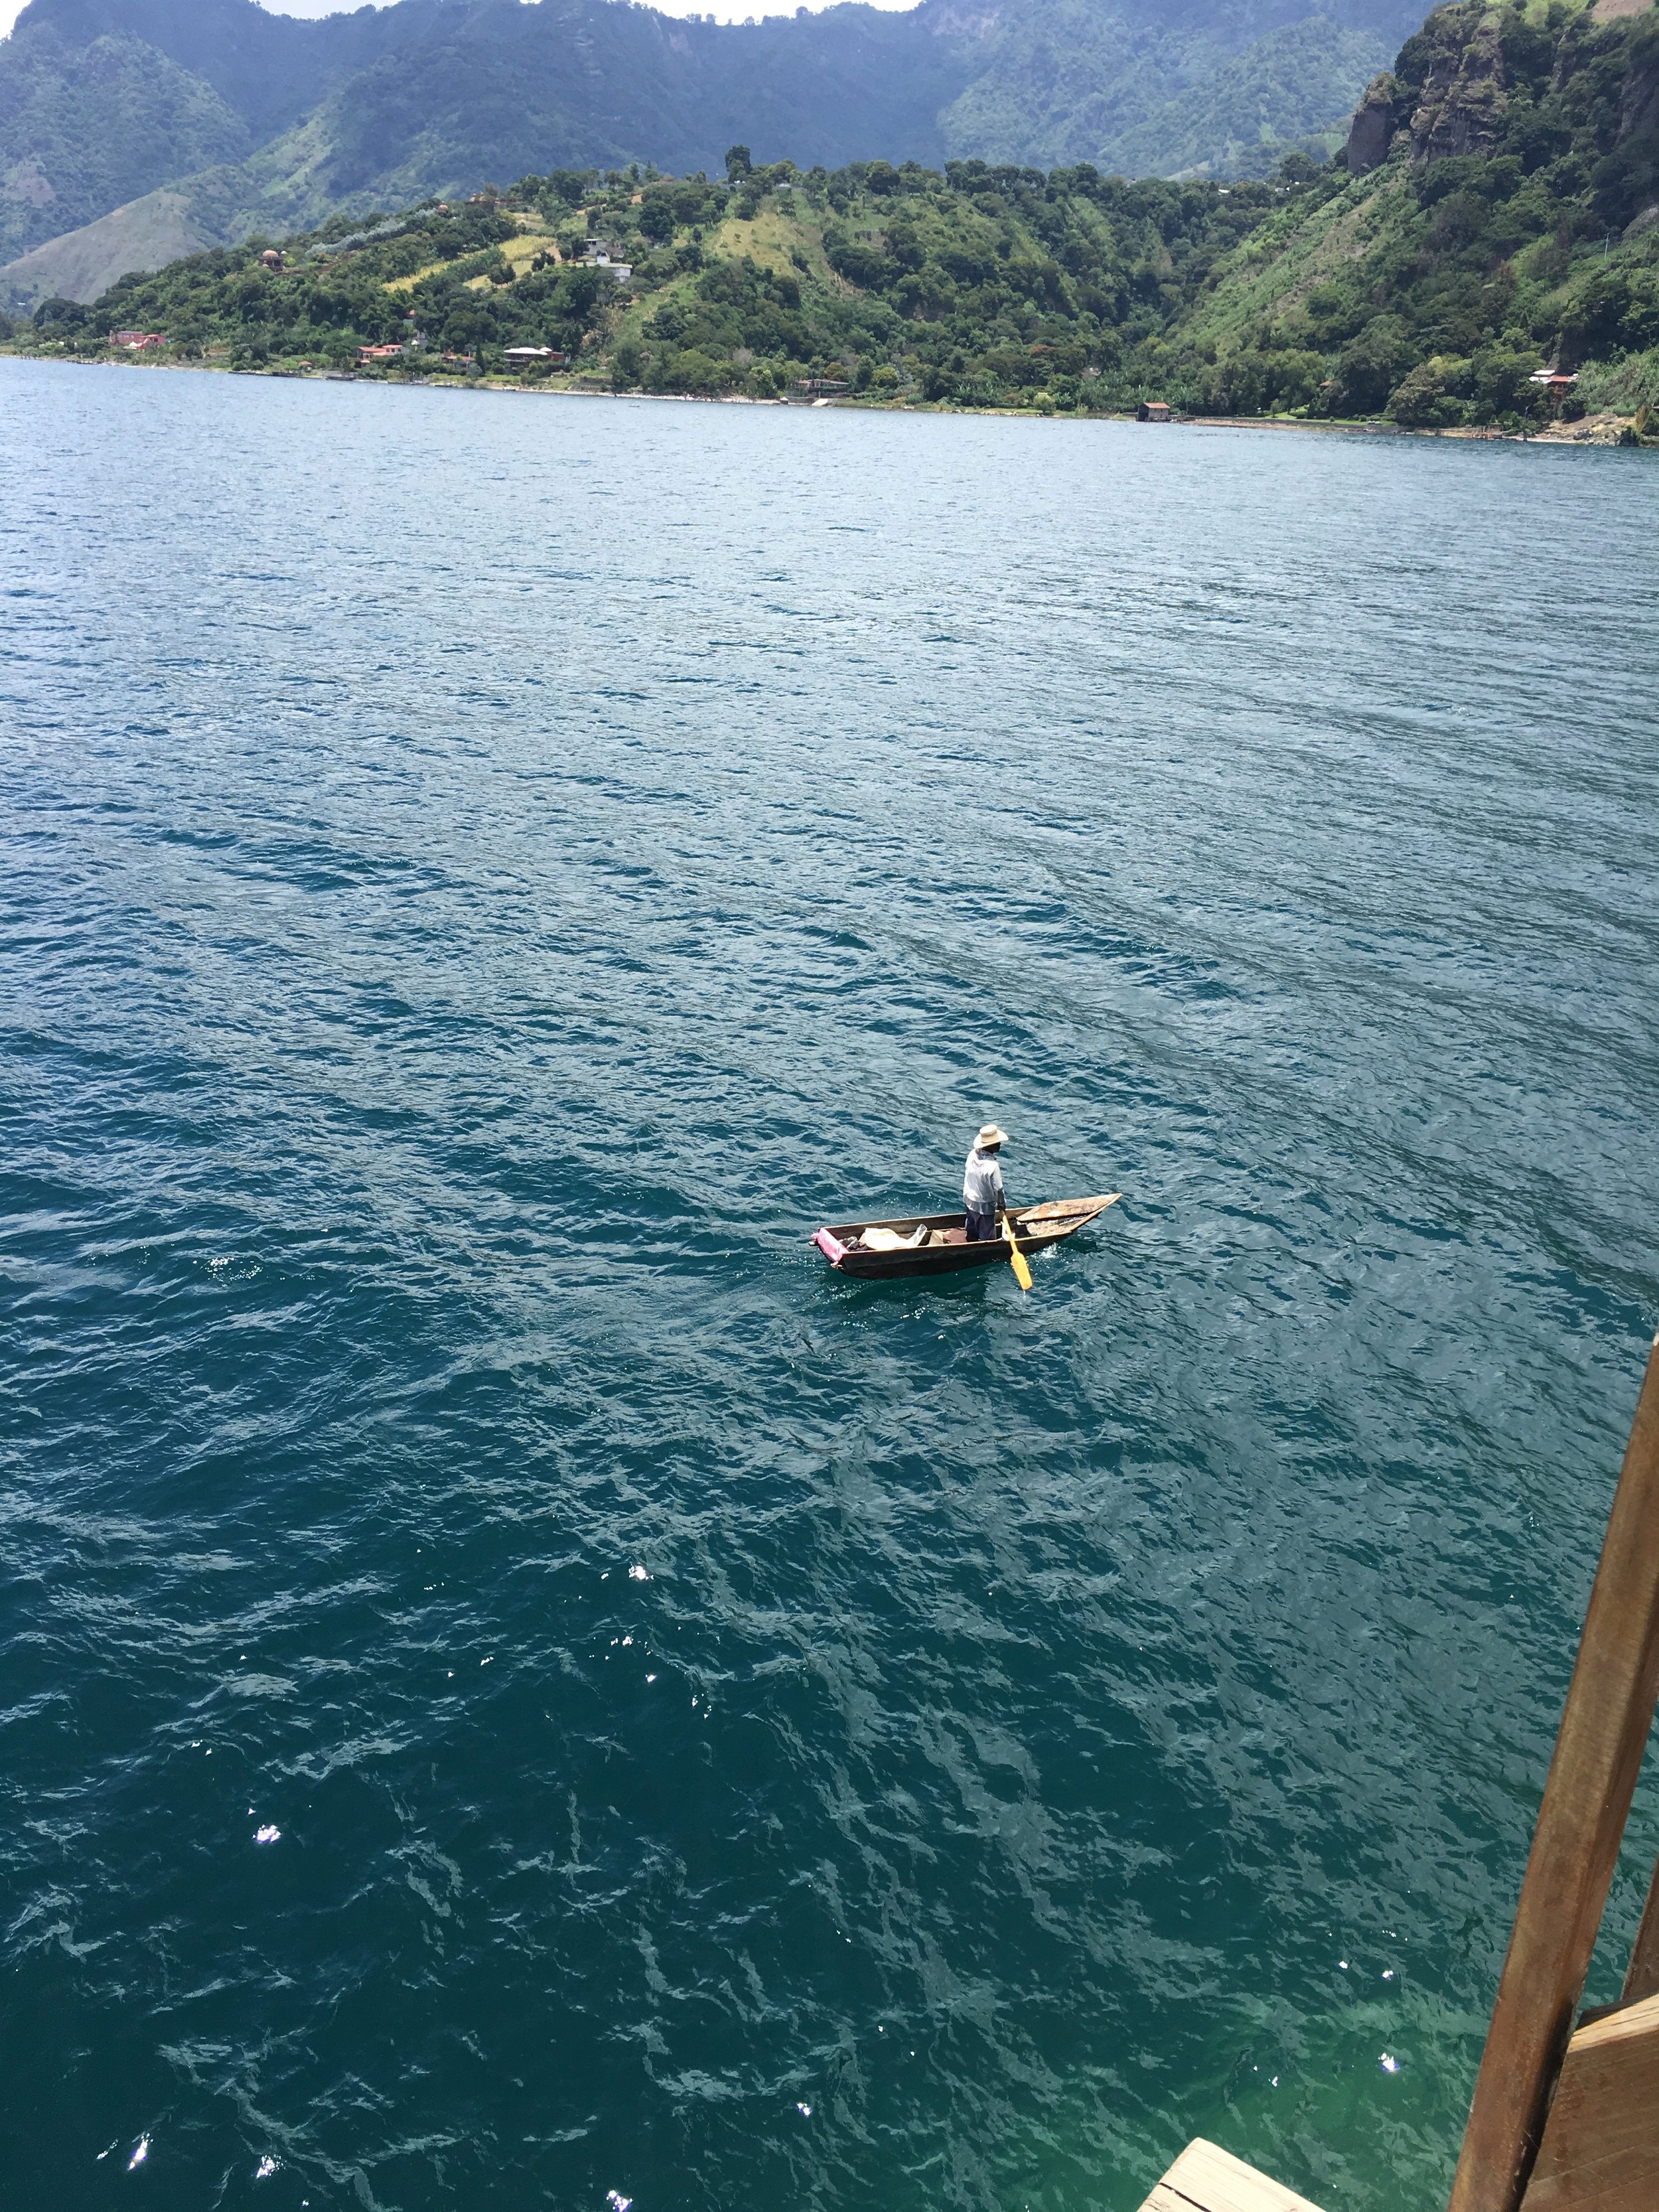 Man rowing his boat